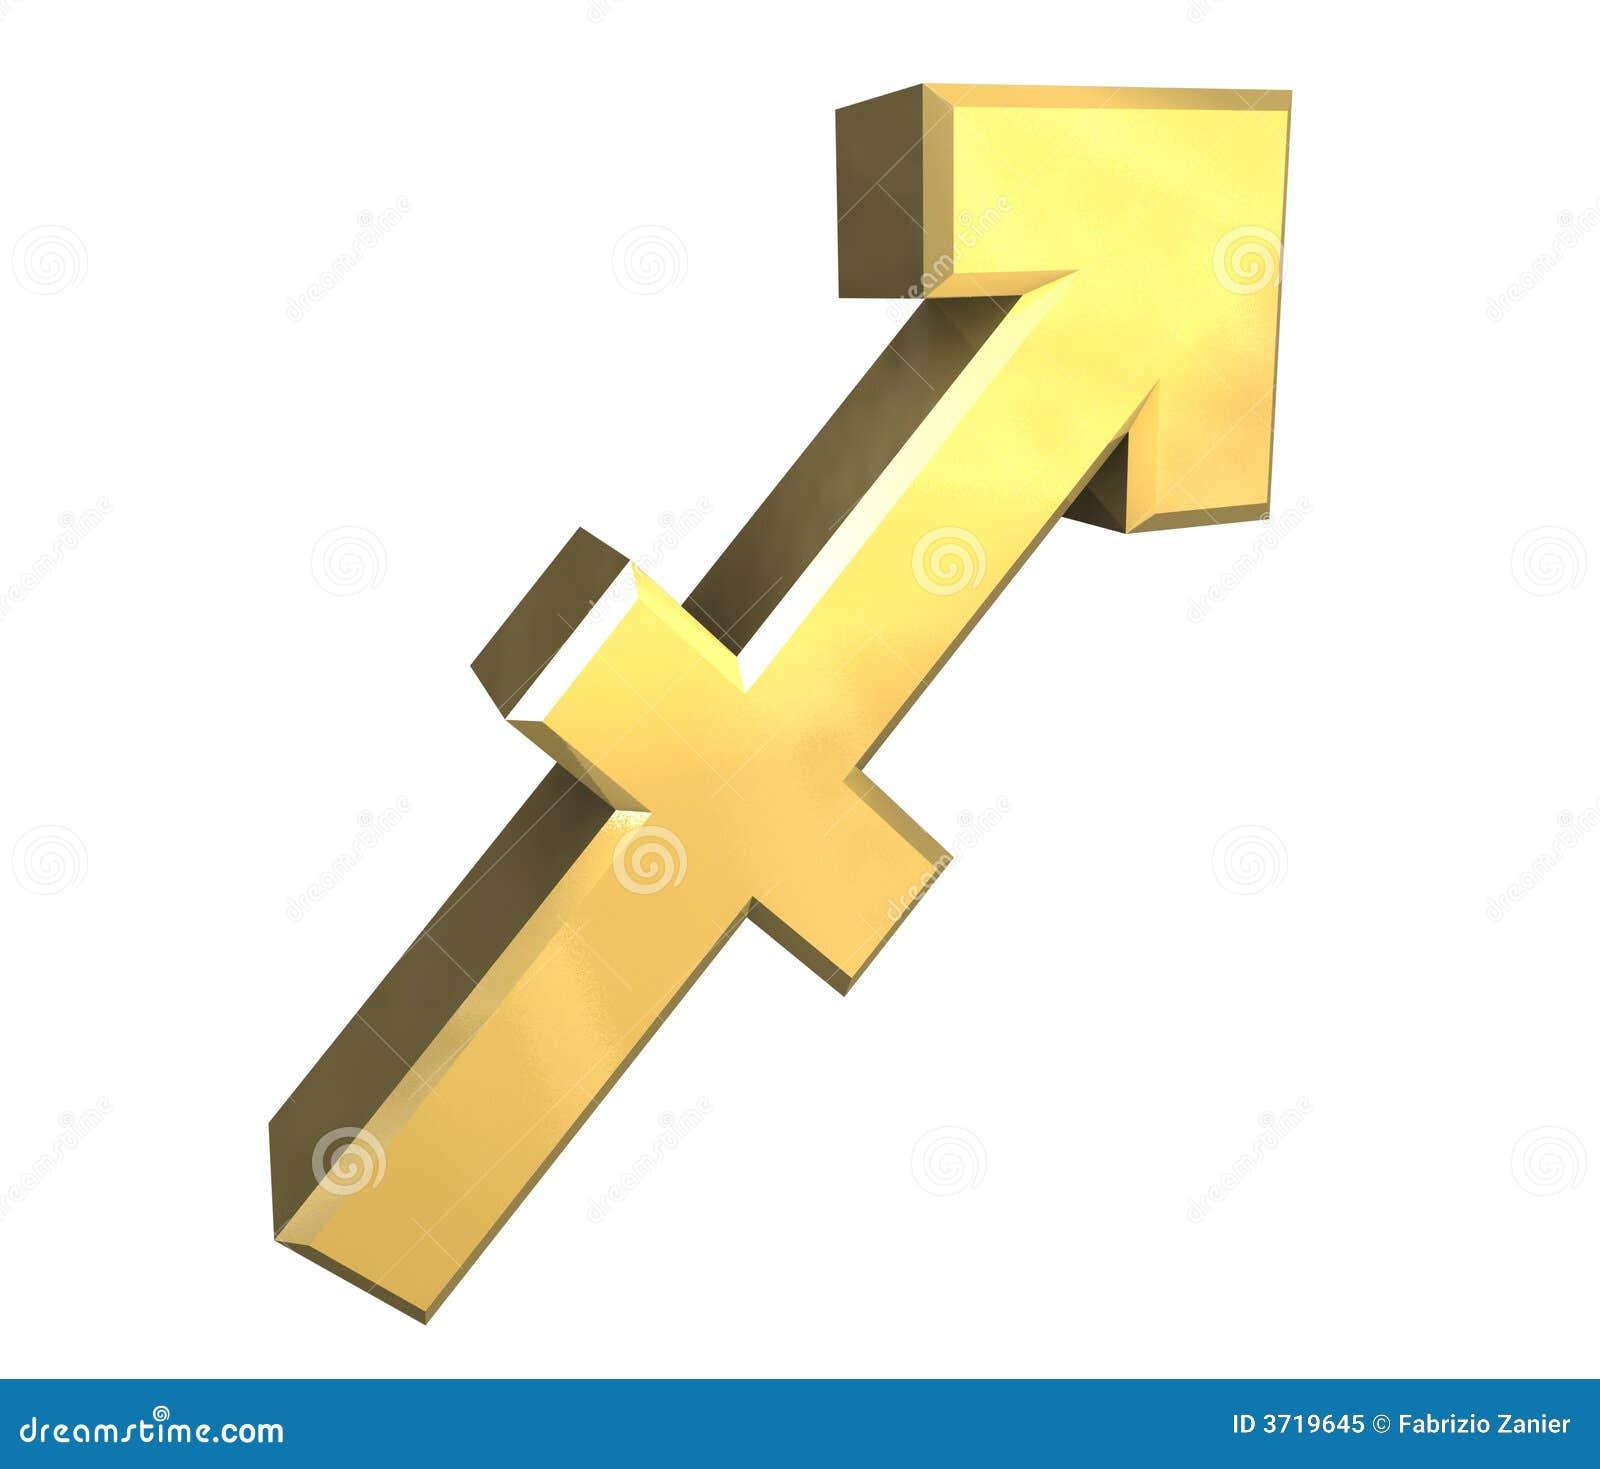 Sagittarius astrology symbol in gold 3d stock illustration sagittarius astrology symbol in gold 3d biocorpaavc